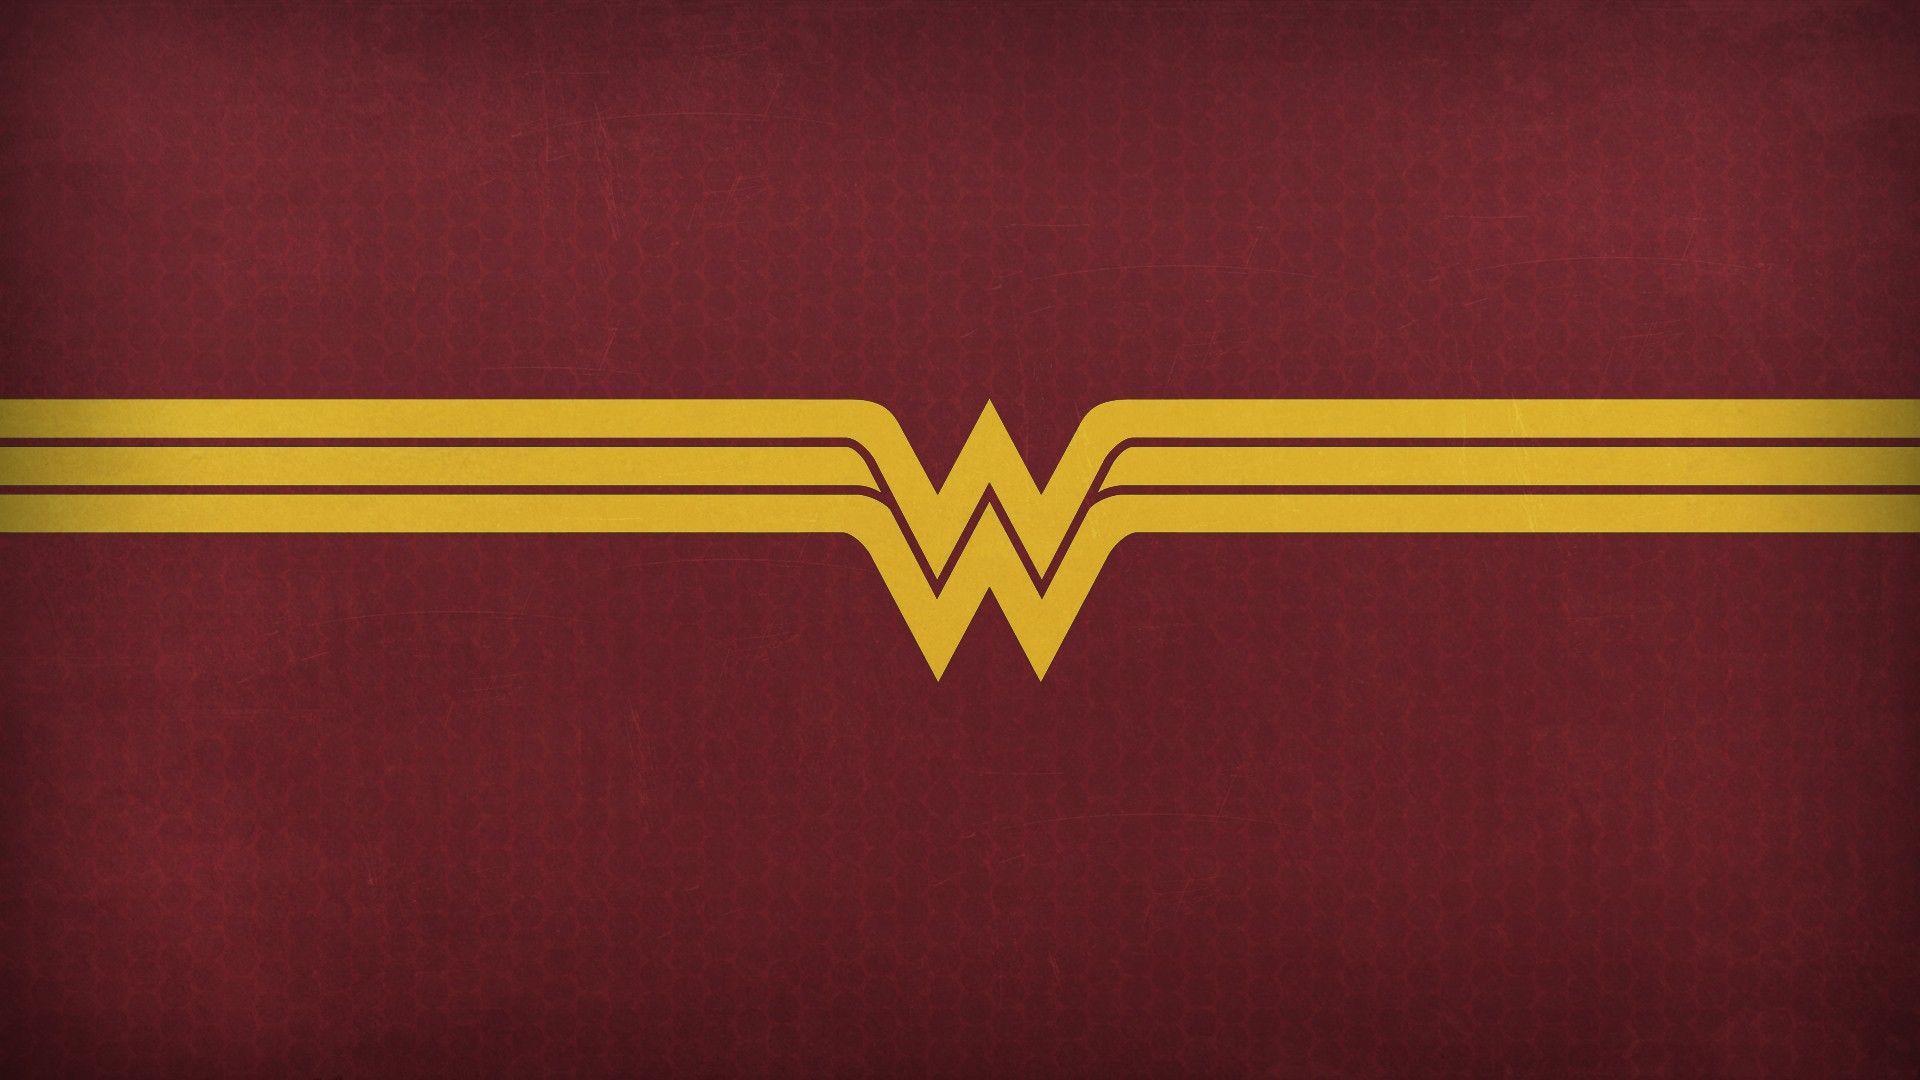 Wonder Woman Computer Wallpapers, Desktop Backgrounds | 1920x1080 ...